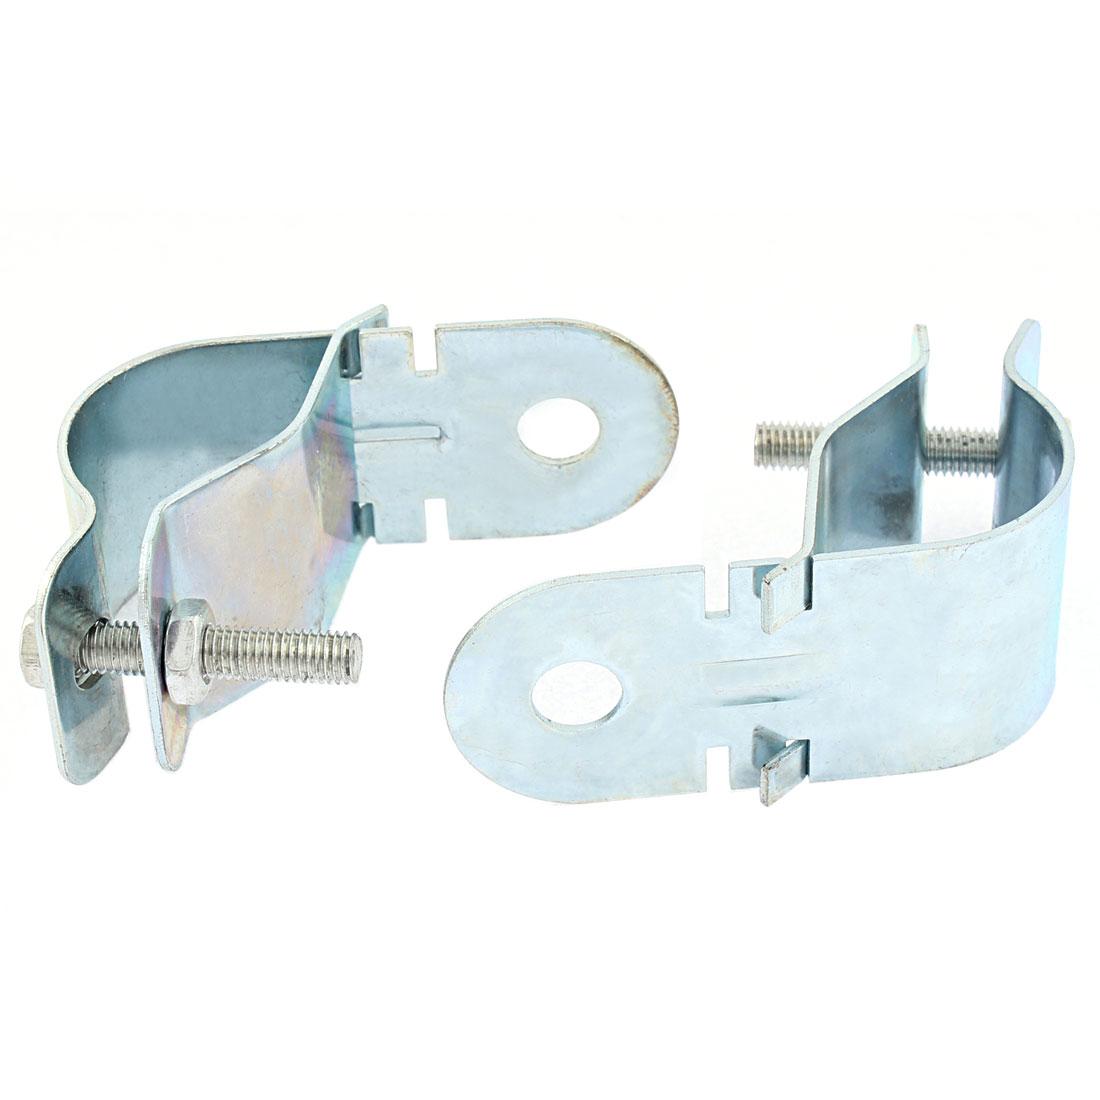 2 Pcs Silver Tone Metal Car Fog Light Headlamp Mounting Bracket Holder